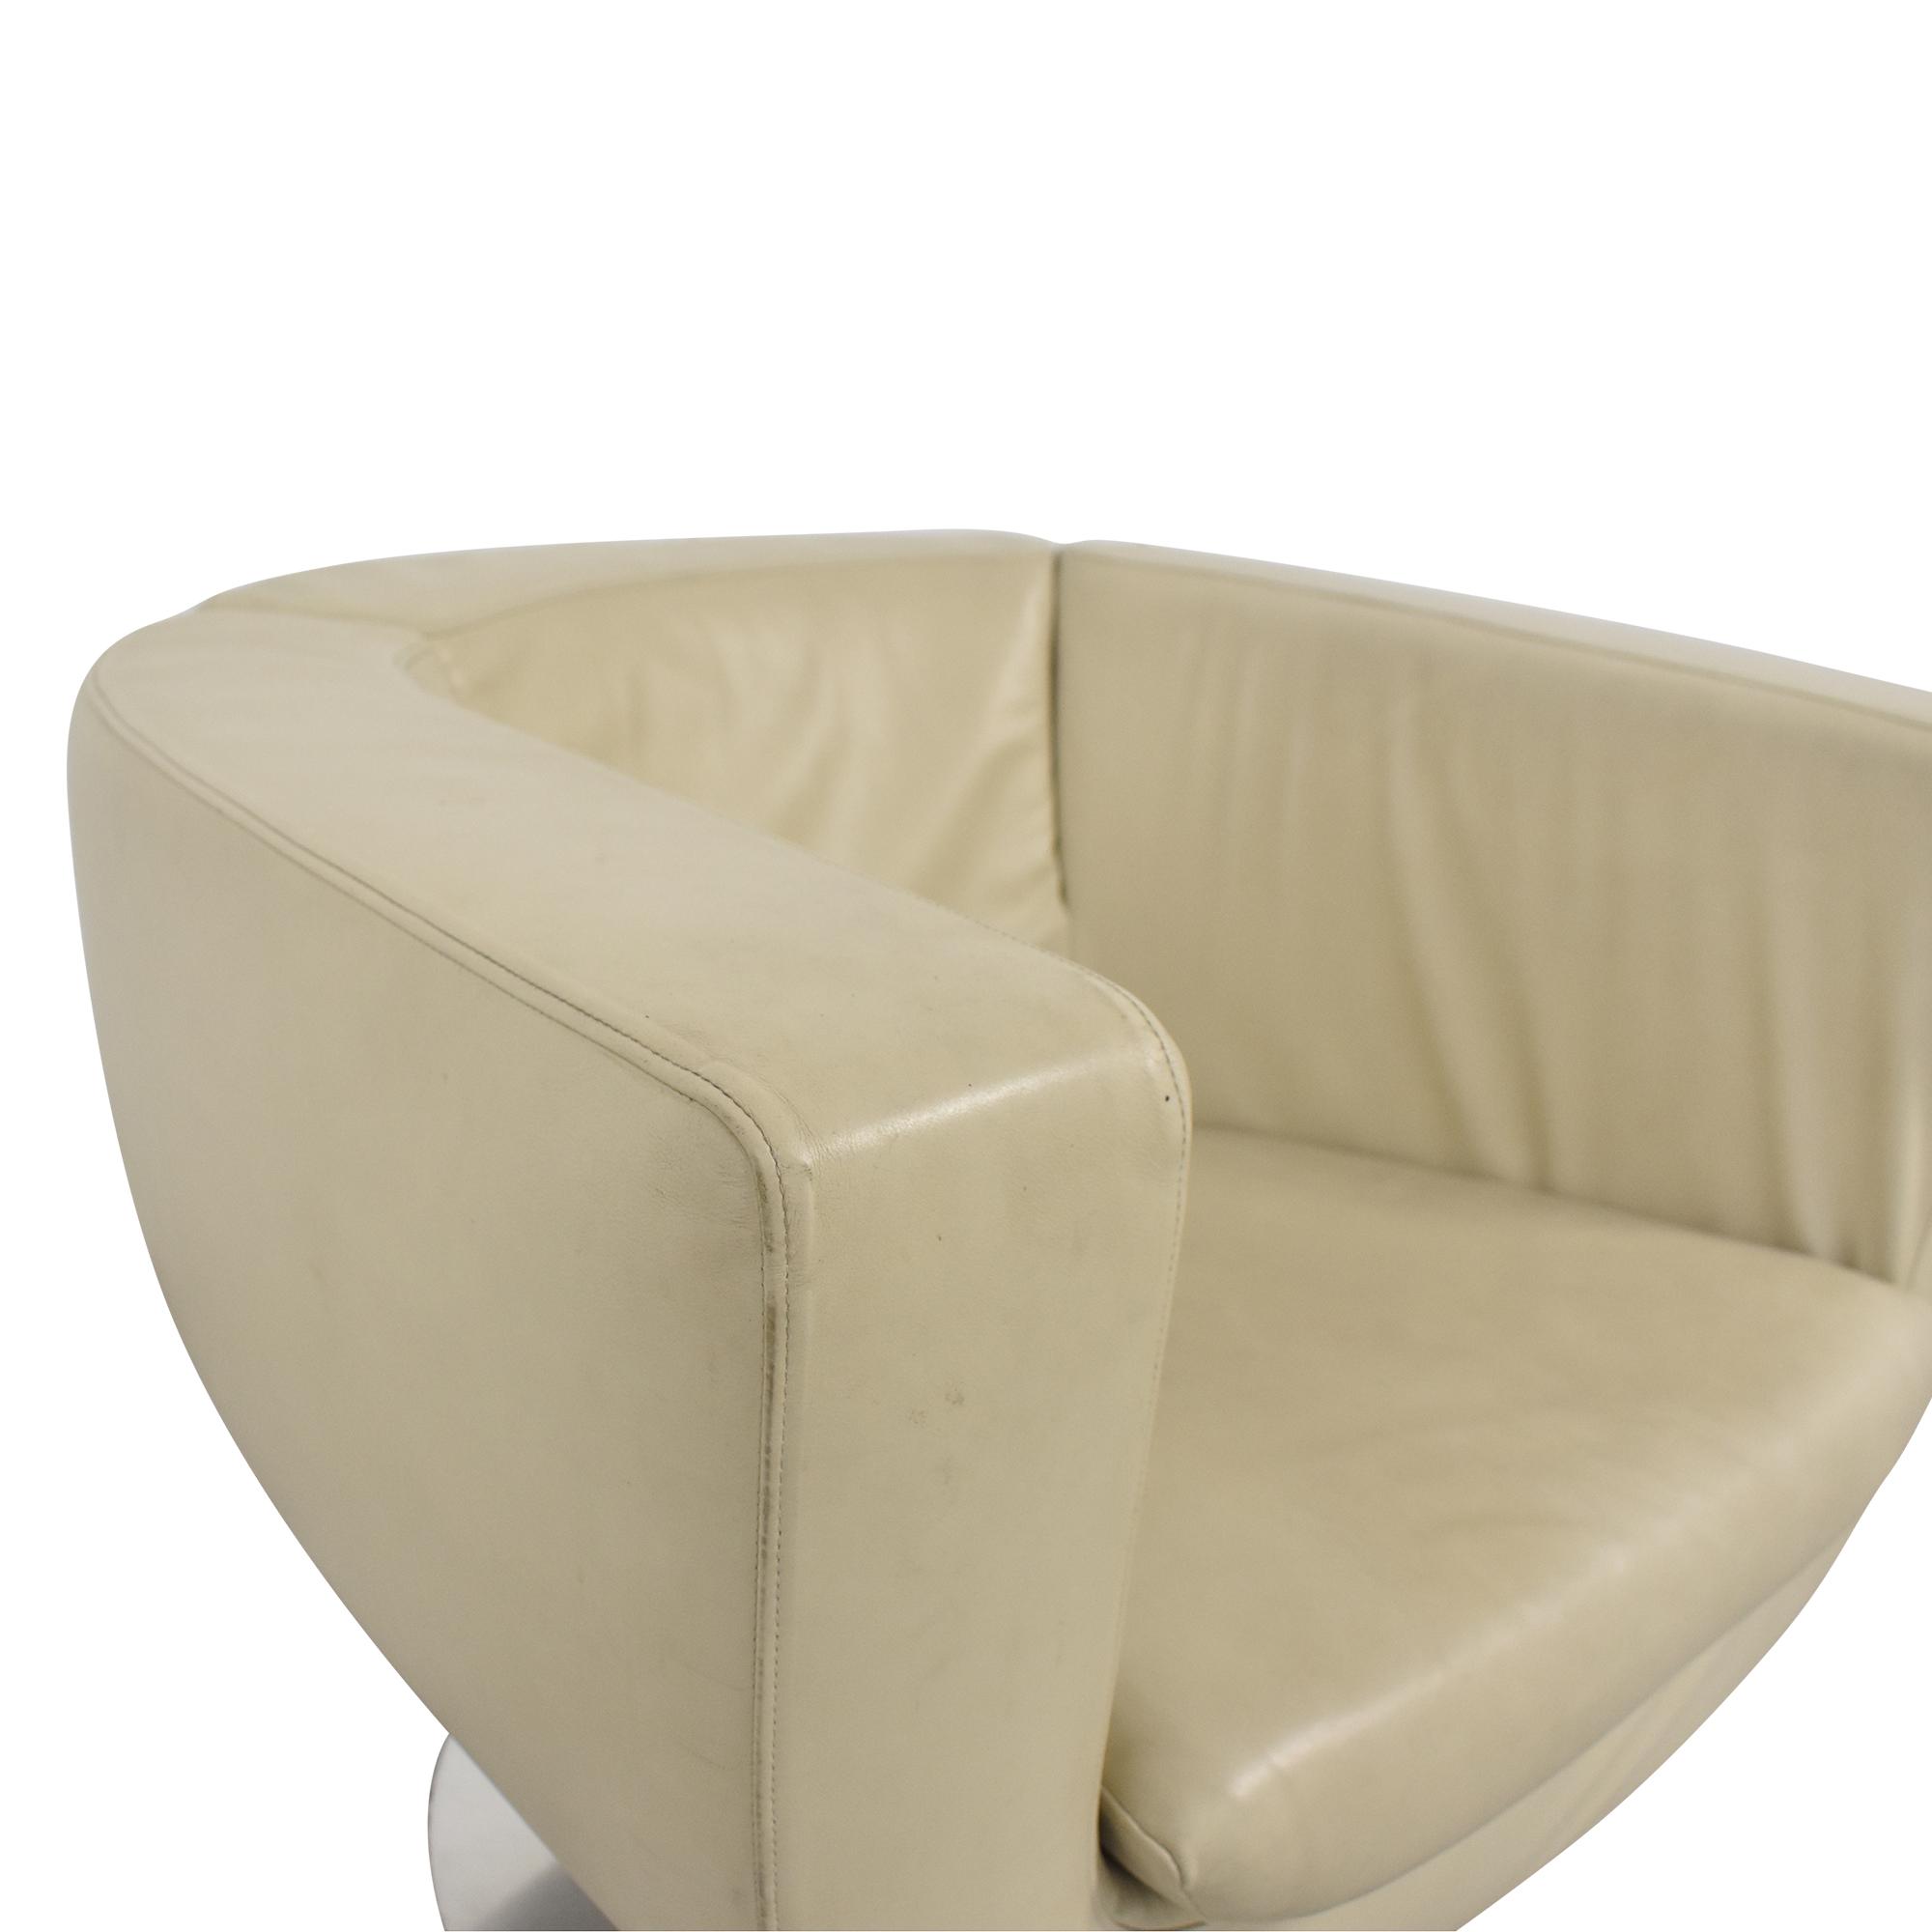 B&B Italia B&B Italia Jeffrey Bernett Tulip Swivel Chair ct